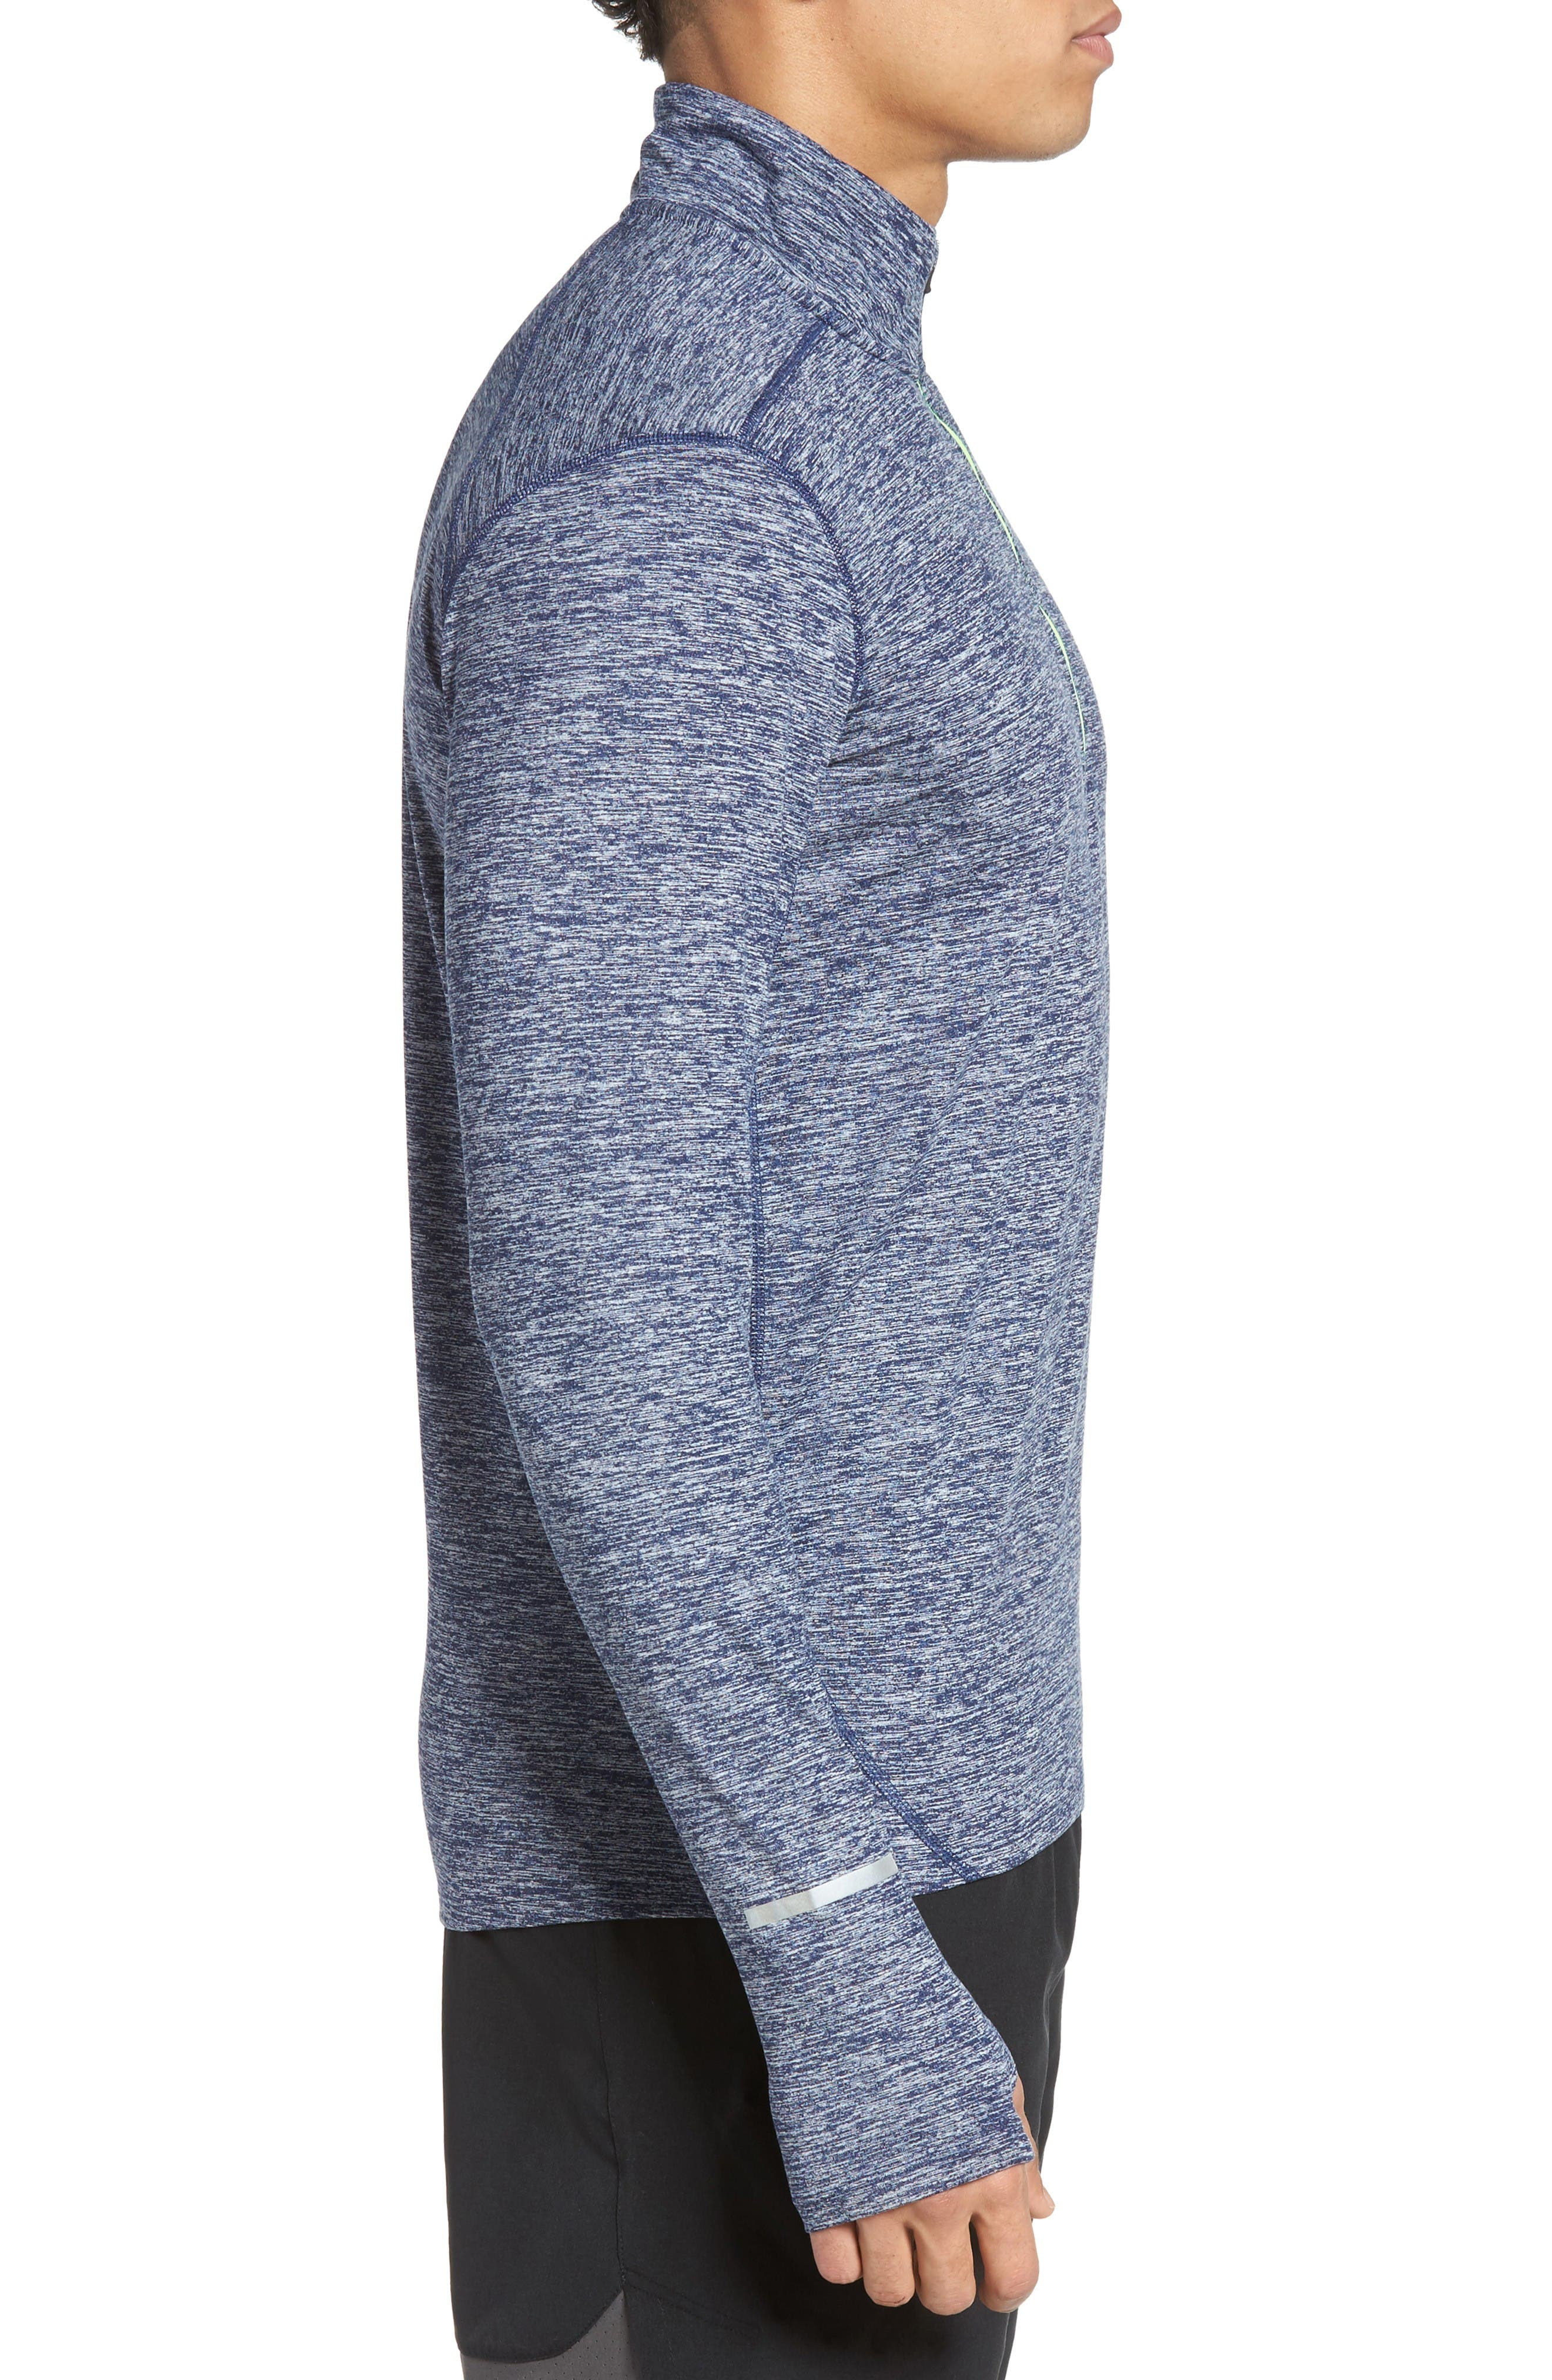 Alternate Image 3  - Nike 'Element' Dri-FIT Quarter Zip Running Top